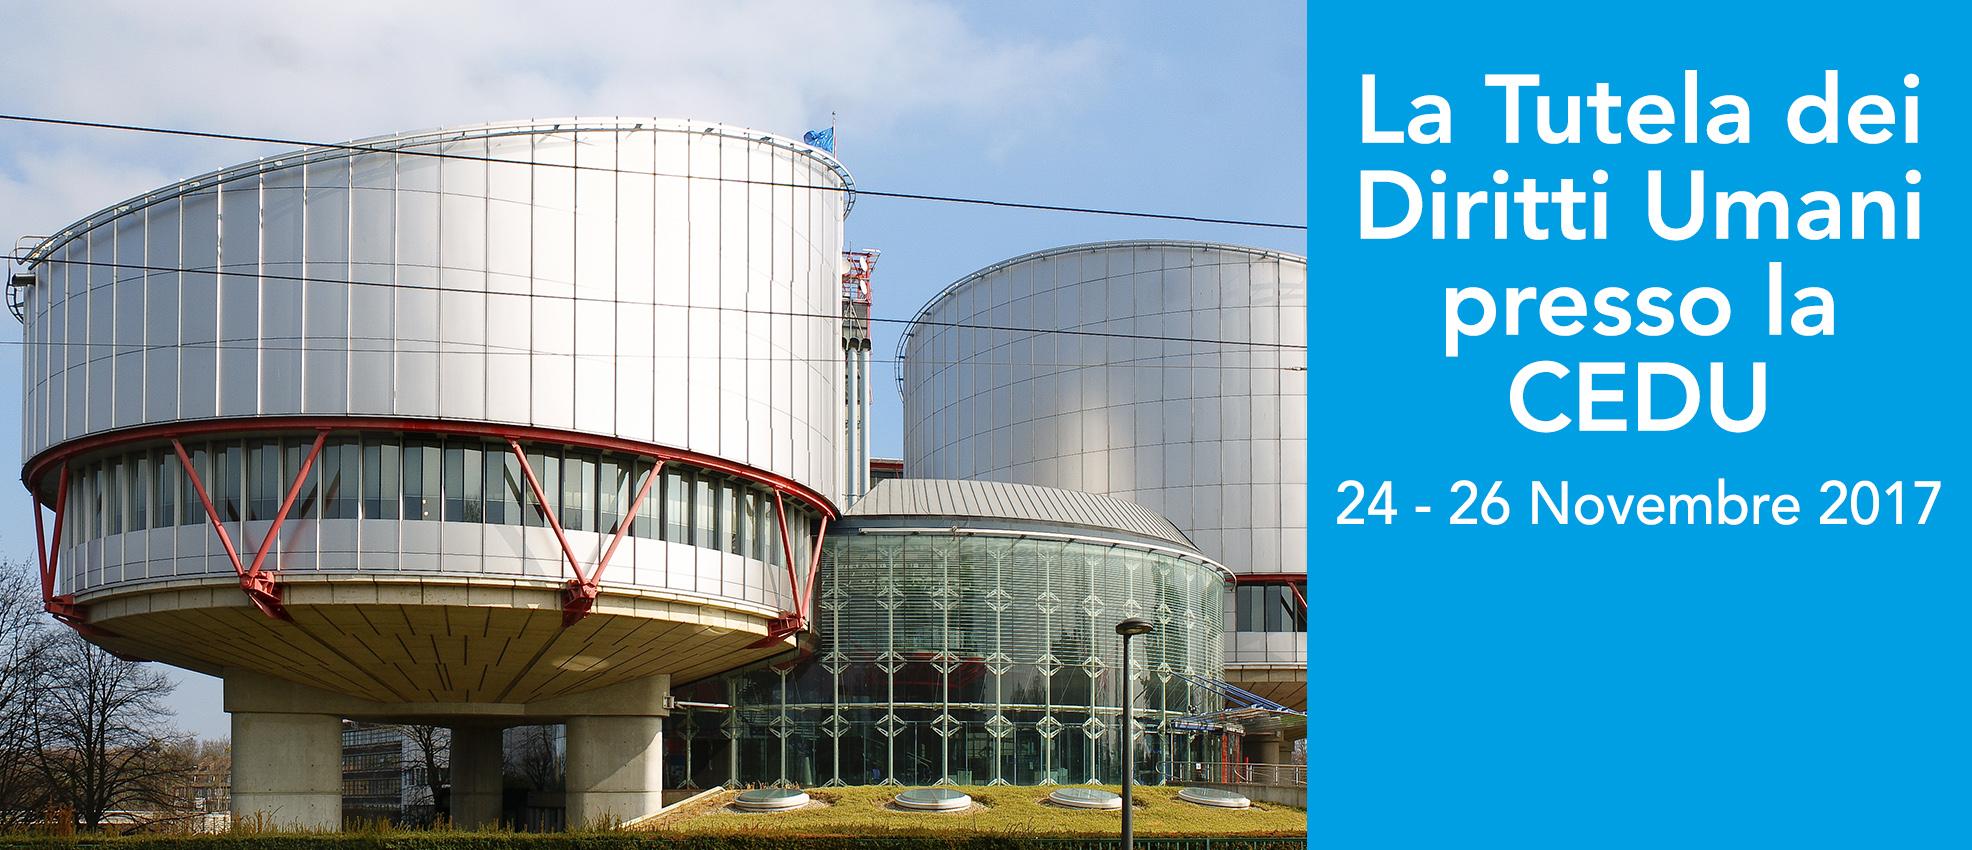 Training su La Tutela dei diritti Umani presso la CEDU